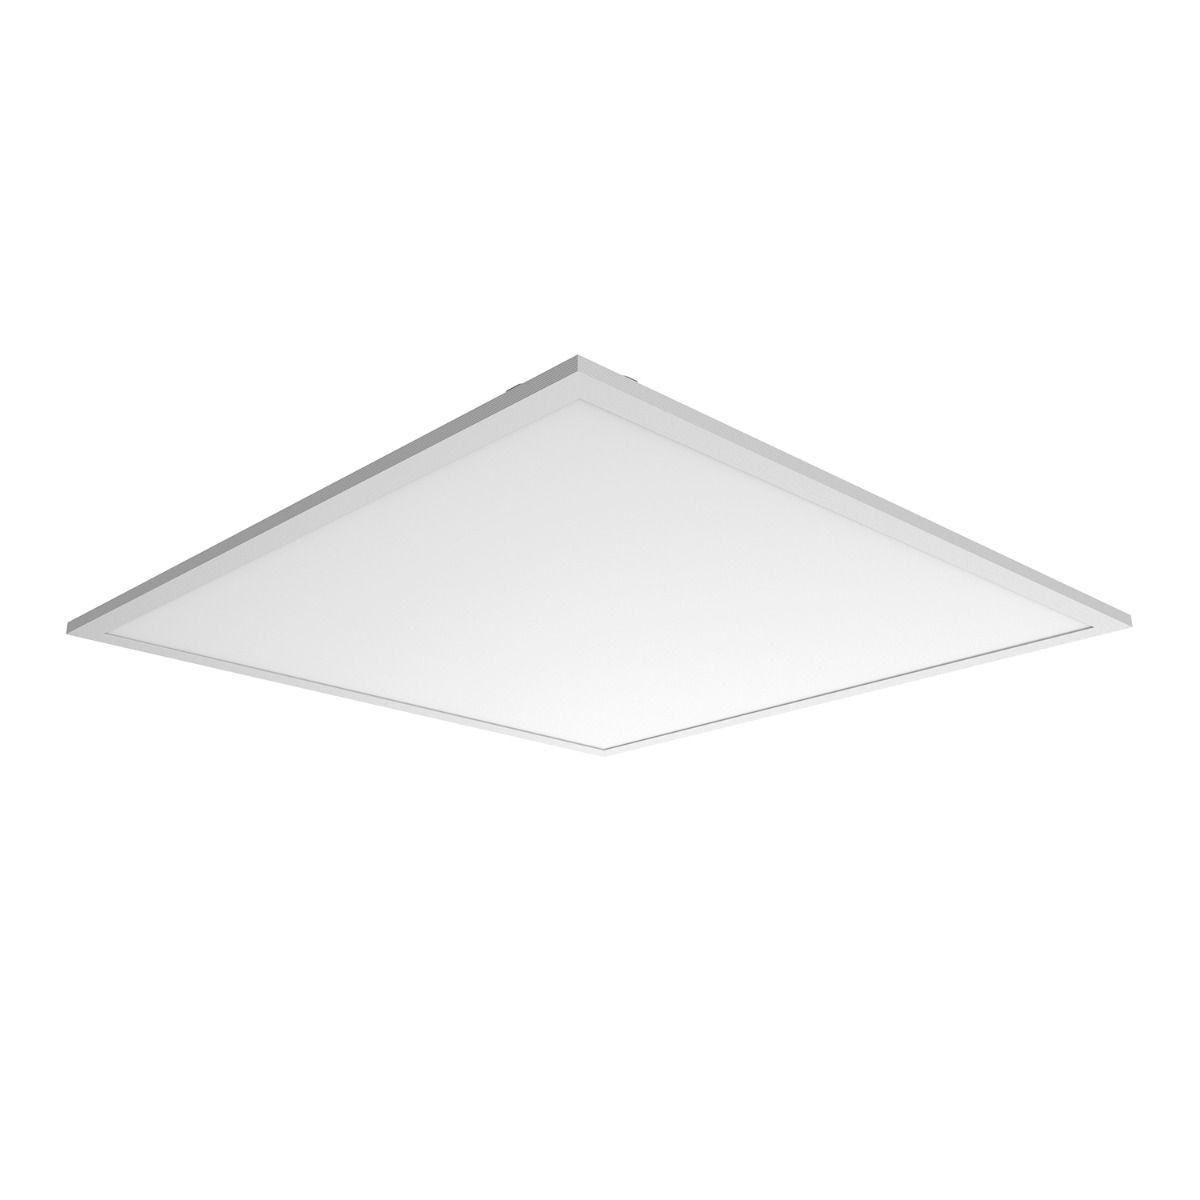 Noxion LED Panel Delta Pro V3 30W 3000K 3960lm 60x60cm UGR <22   Warmweiß - Ersatz für 4x18W